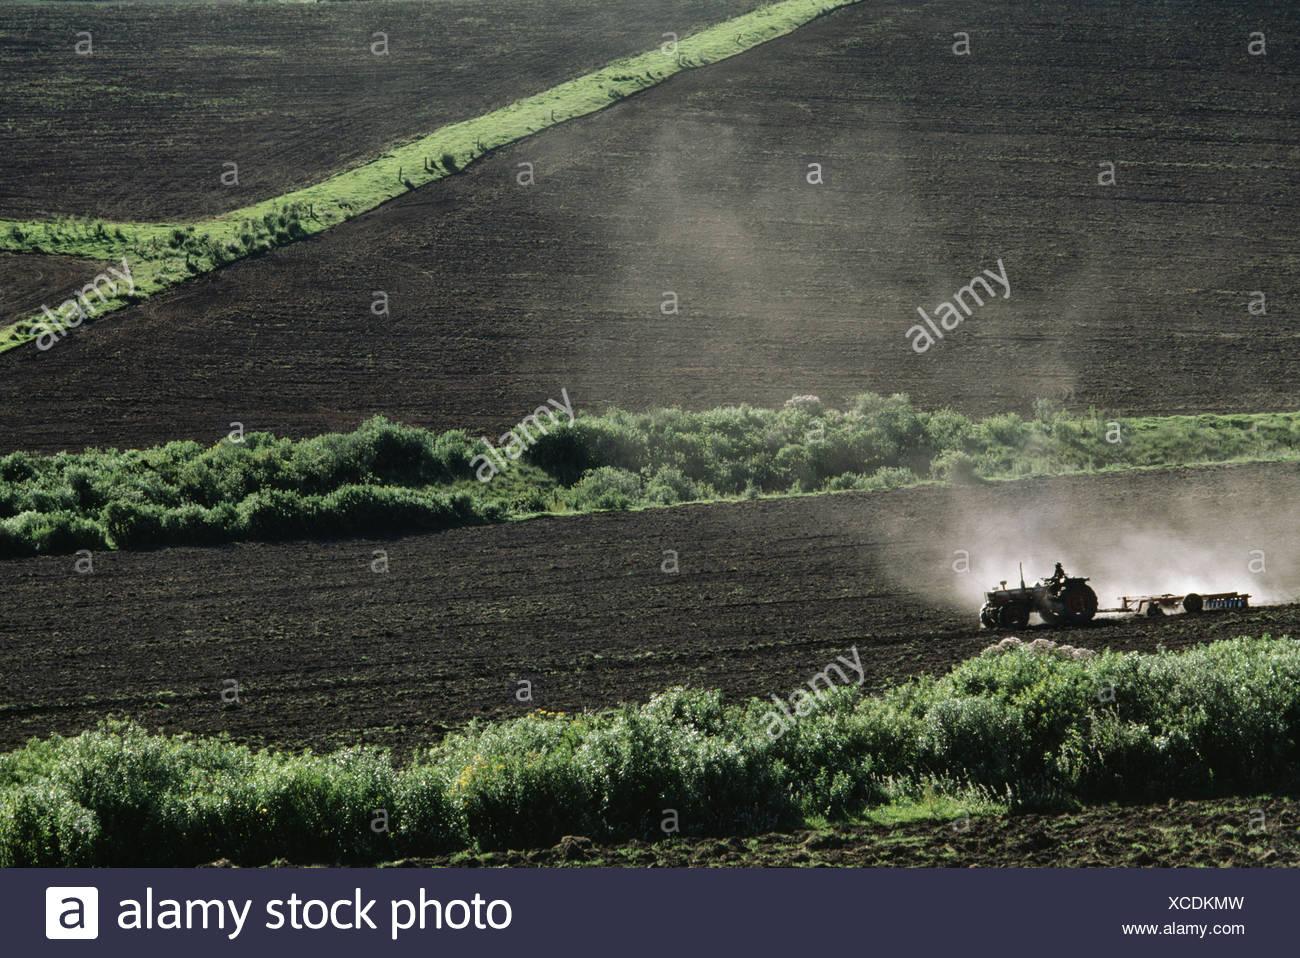 Kenya Tractors tilling soil farm recently cleared Kenya - Stock Image